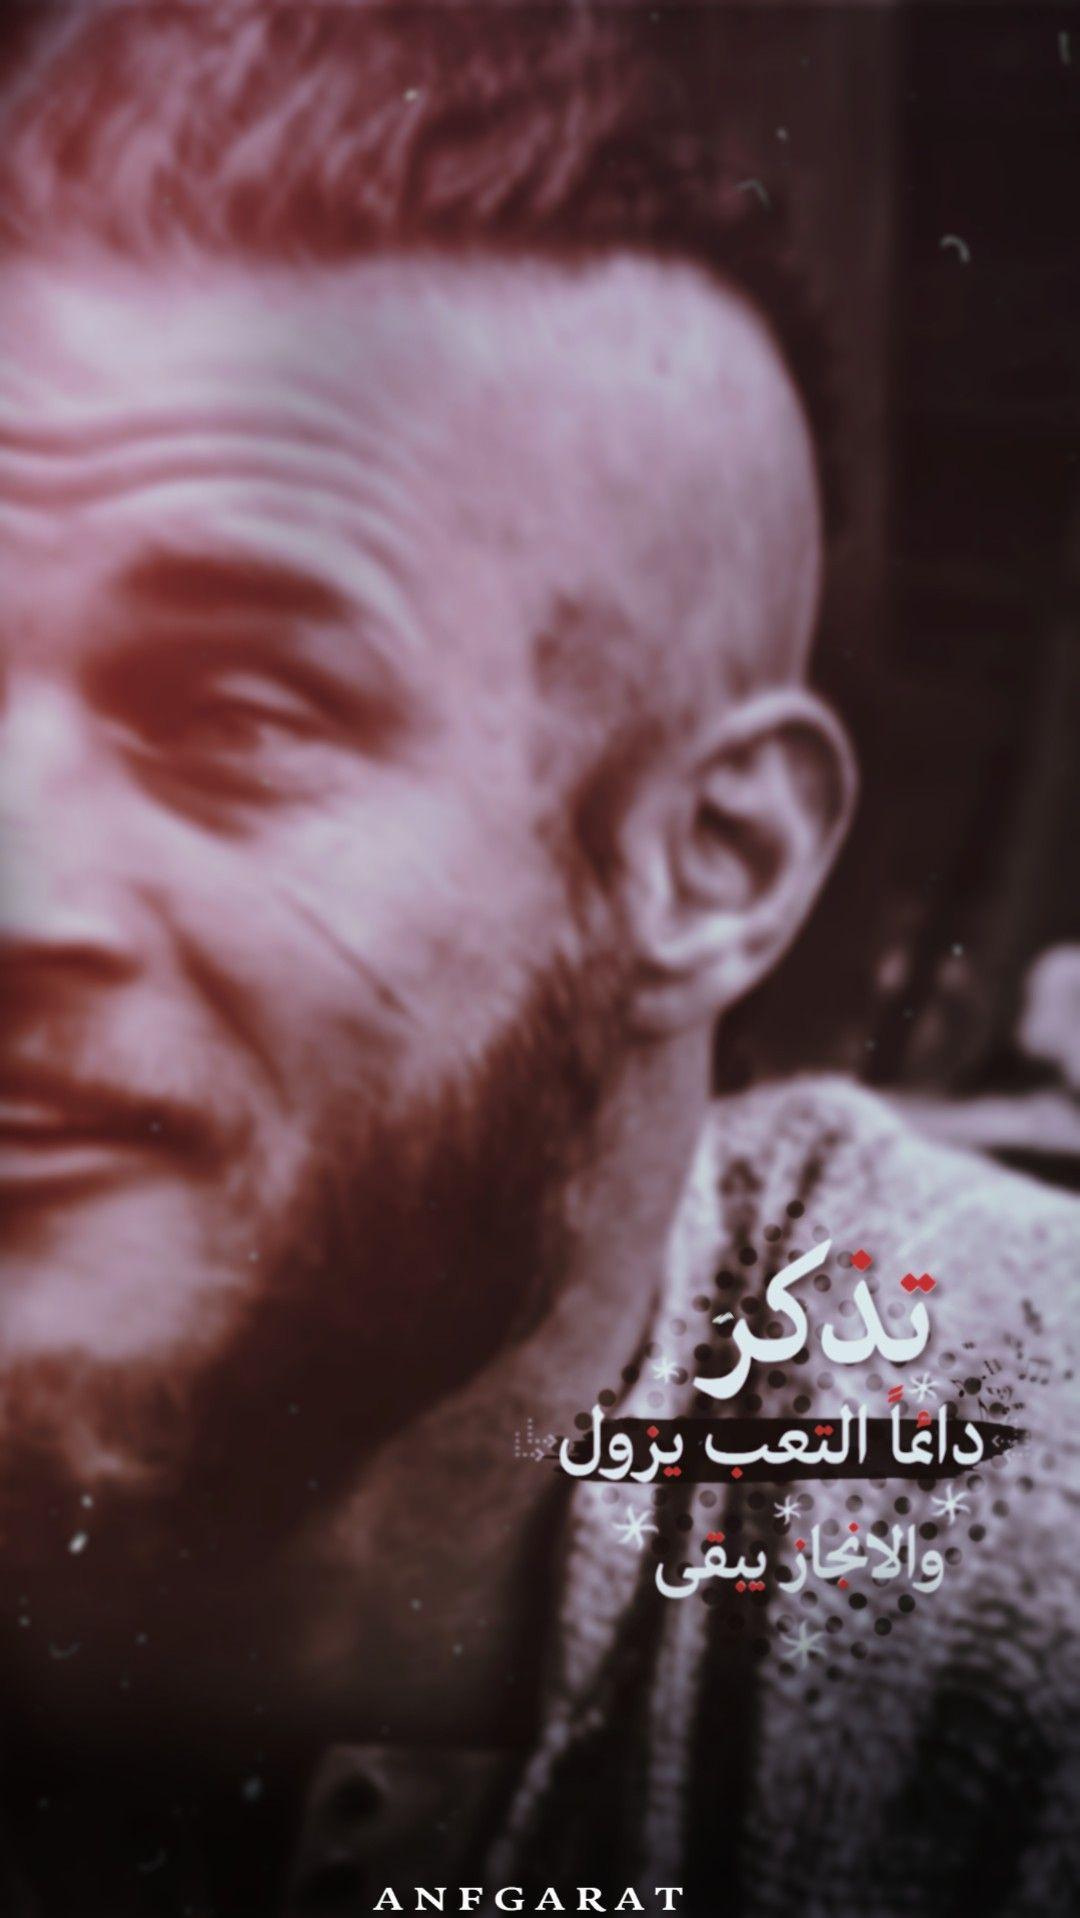 رمزيات صور العراق كتابات خواطر حكم صخام الصخمكم راكنر راگنر تابعني فولو Photo Movie Posters Poster